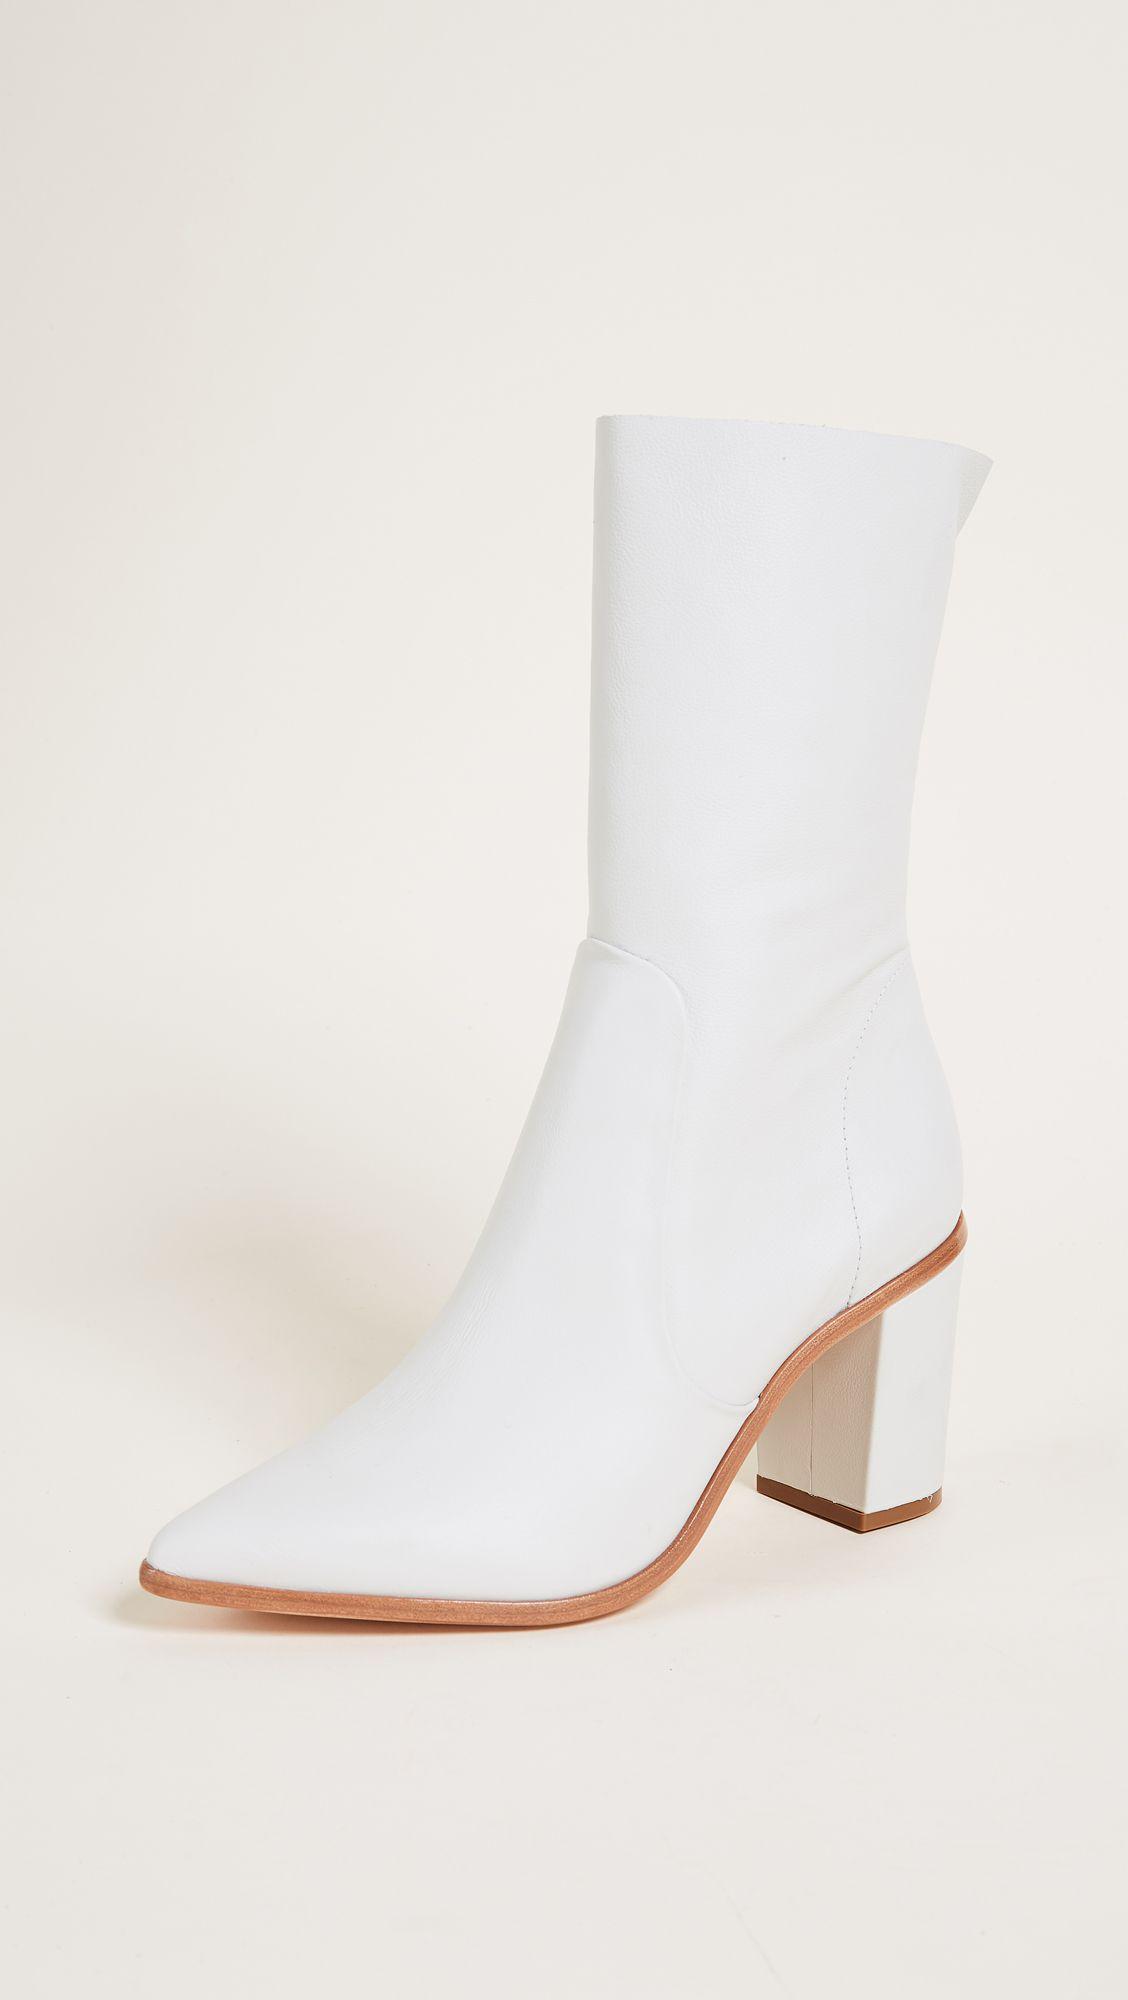 A pair of white Schutz boots